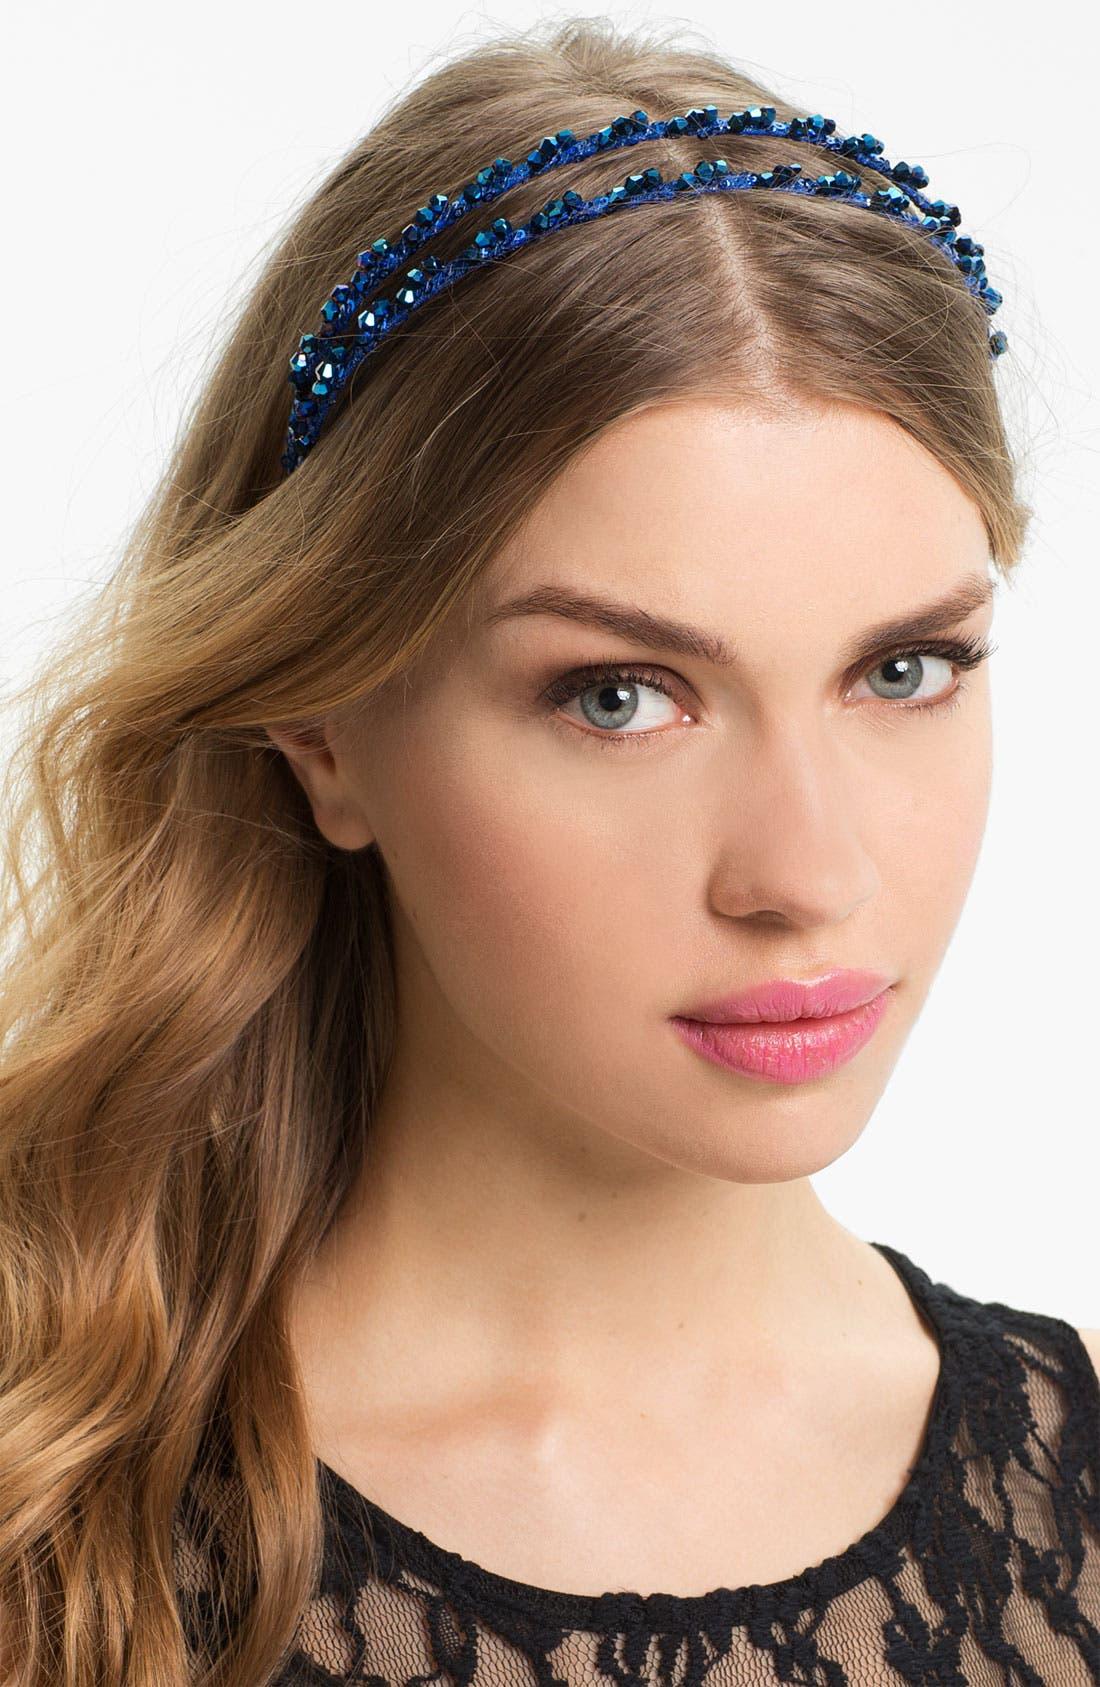 Alternate Image 1 Selected - Tasha 'Double Trouble' Headband